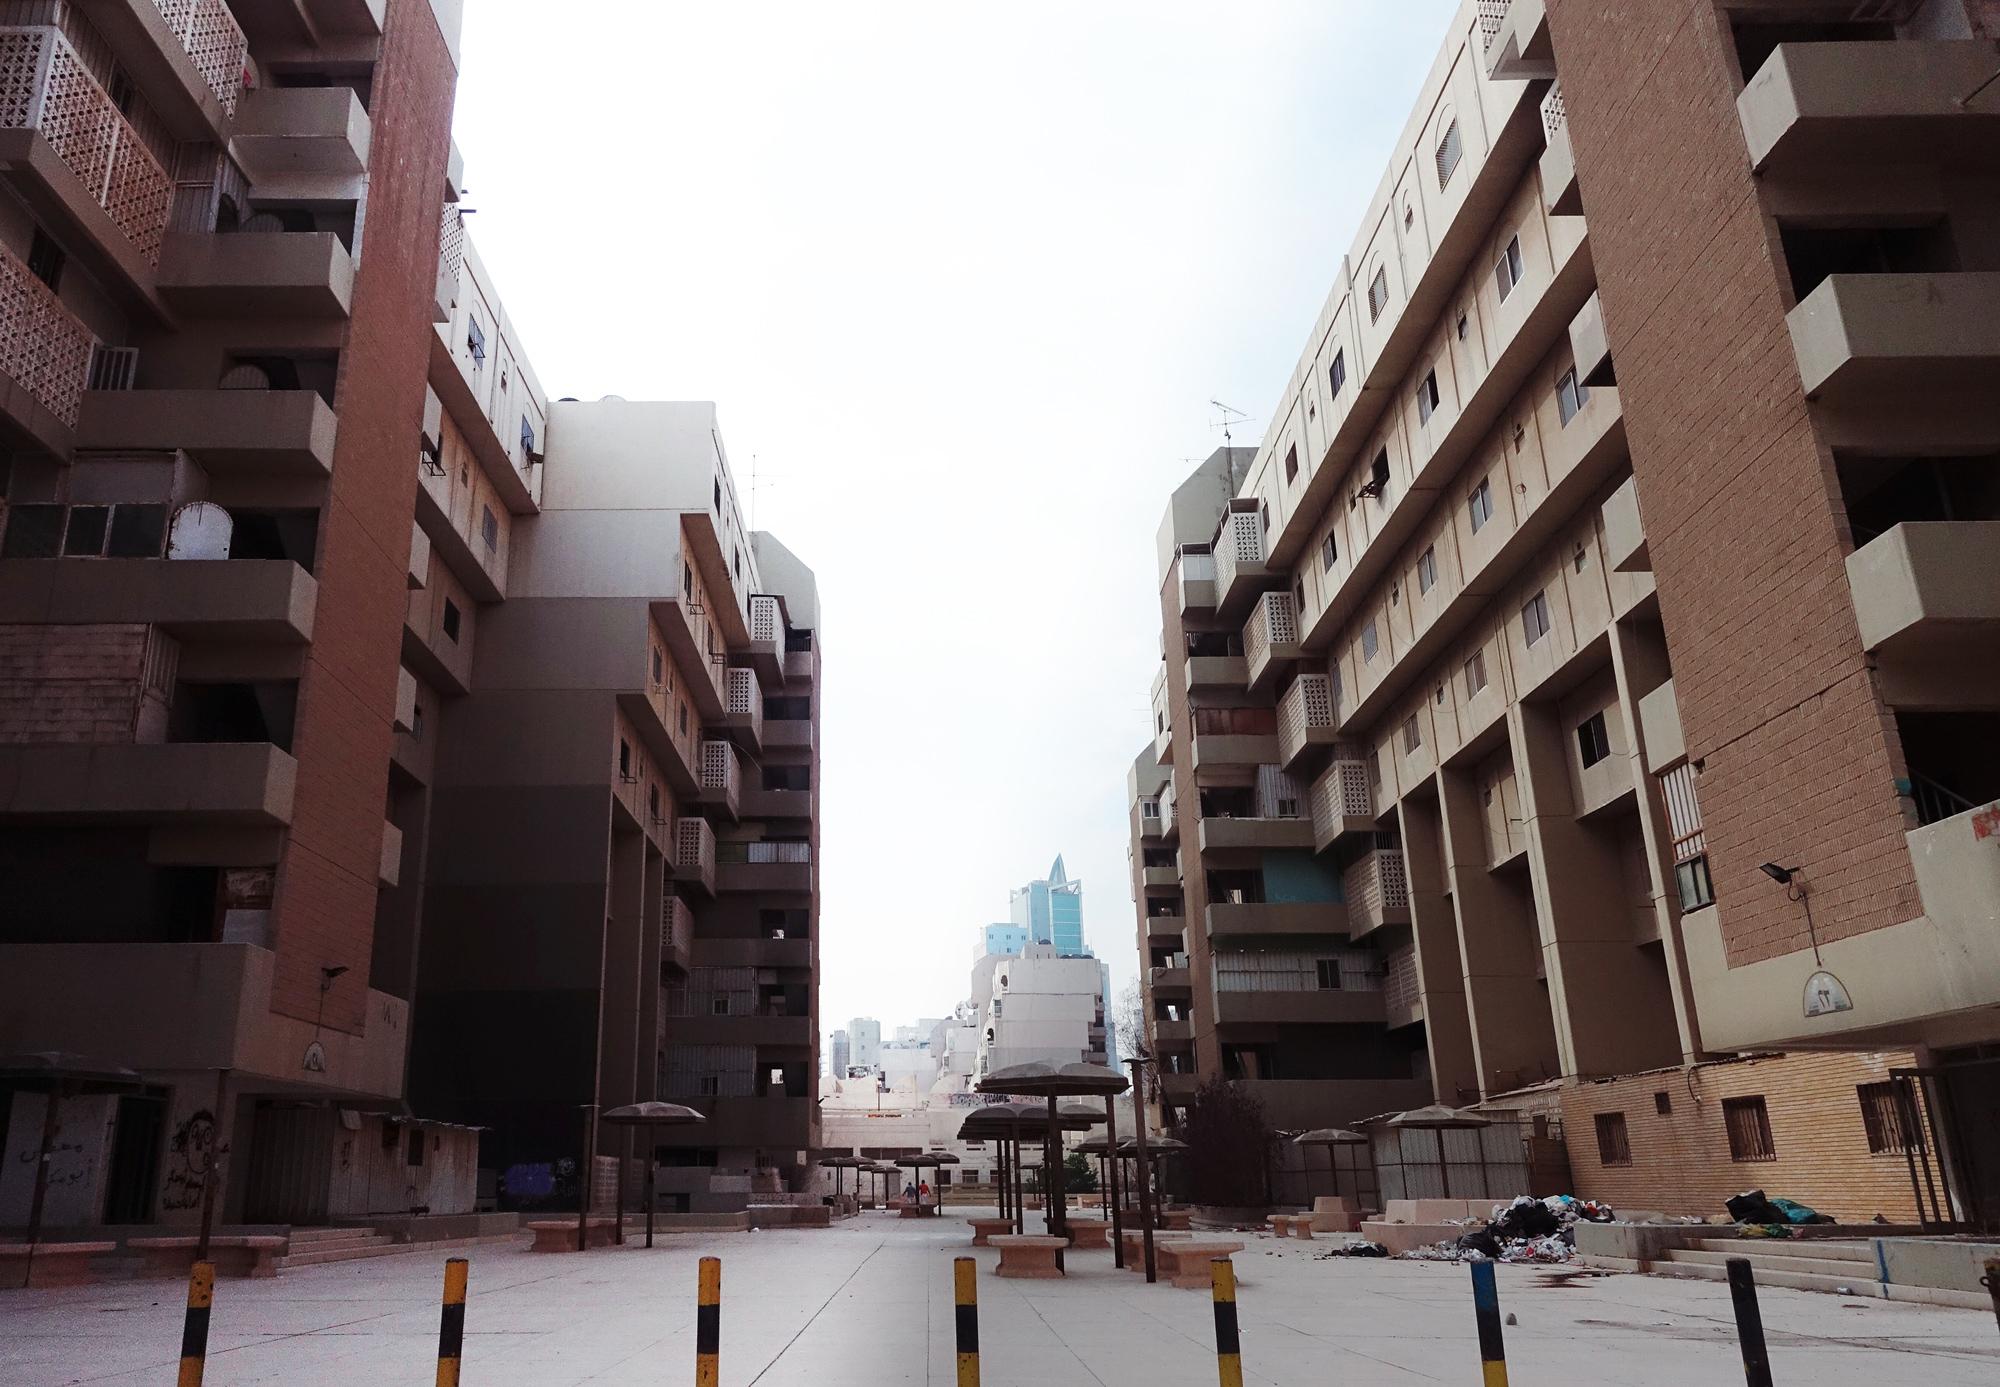 urbanbacklog-kuwait-dhari-al-muawed-3.jpg